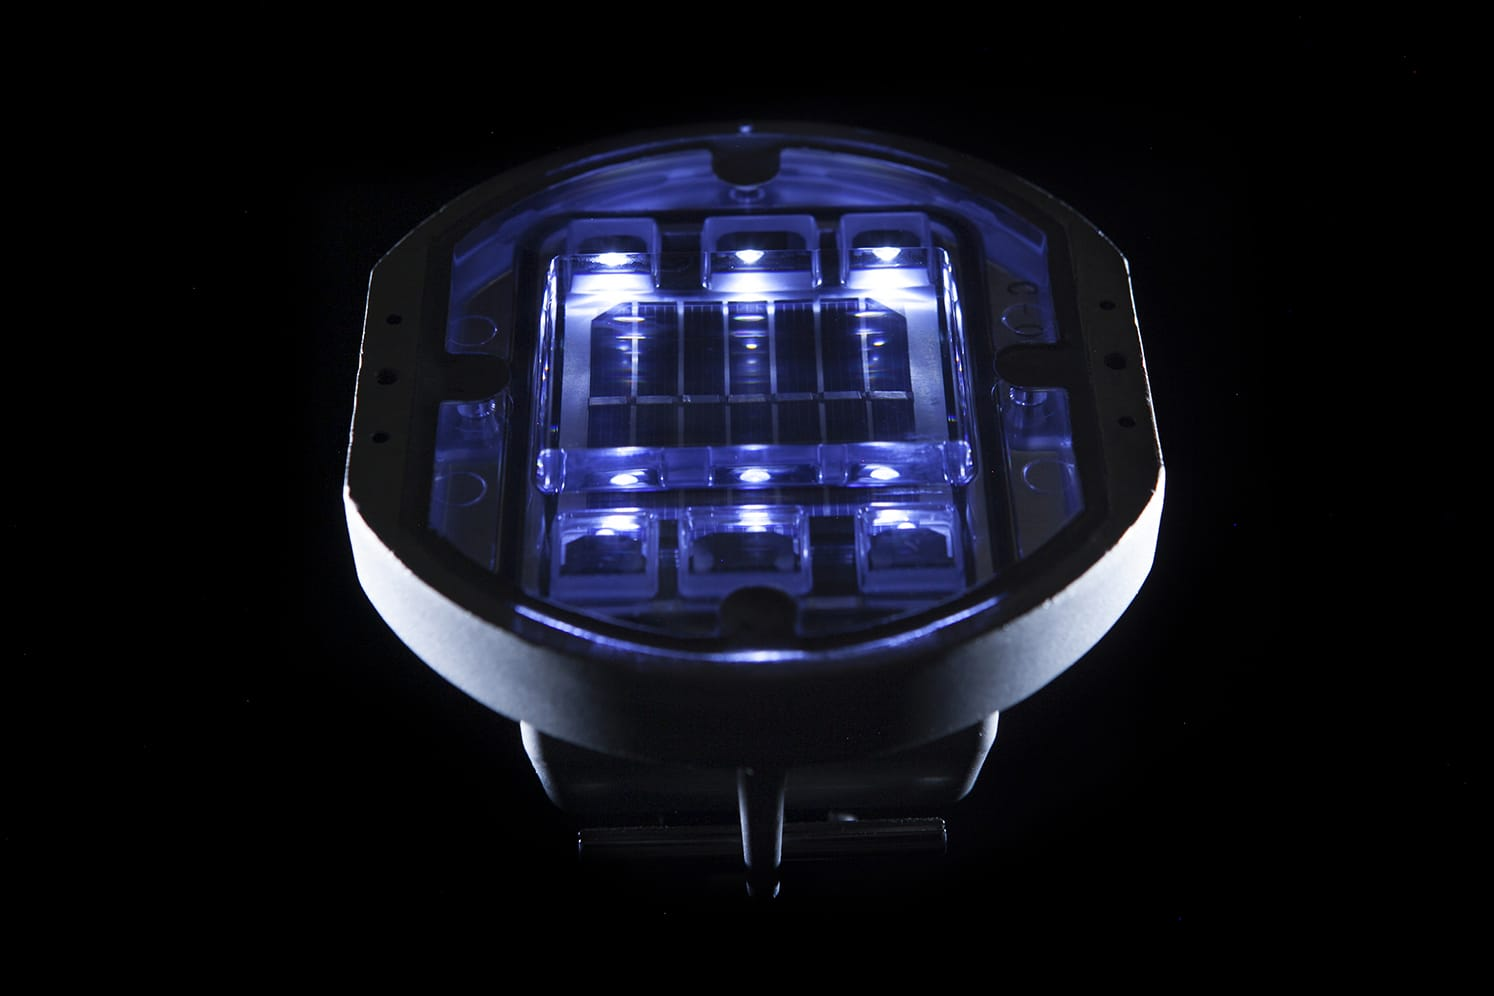 Plot solaire routier giratoire ECO-142 bleu